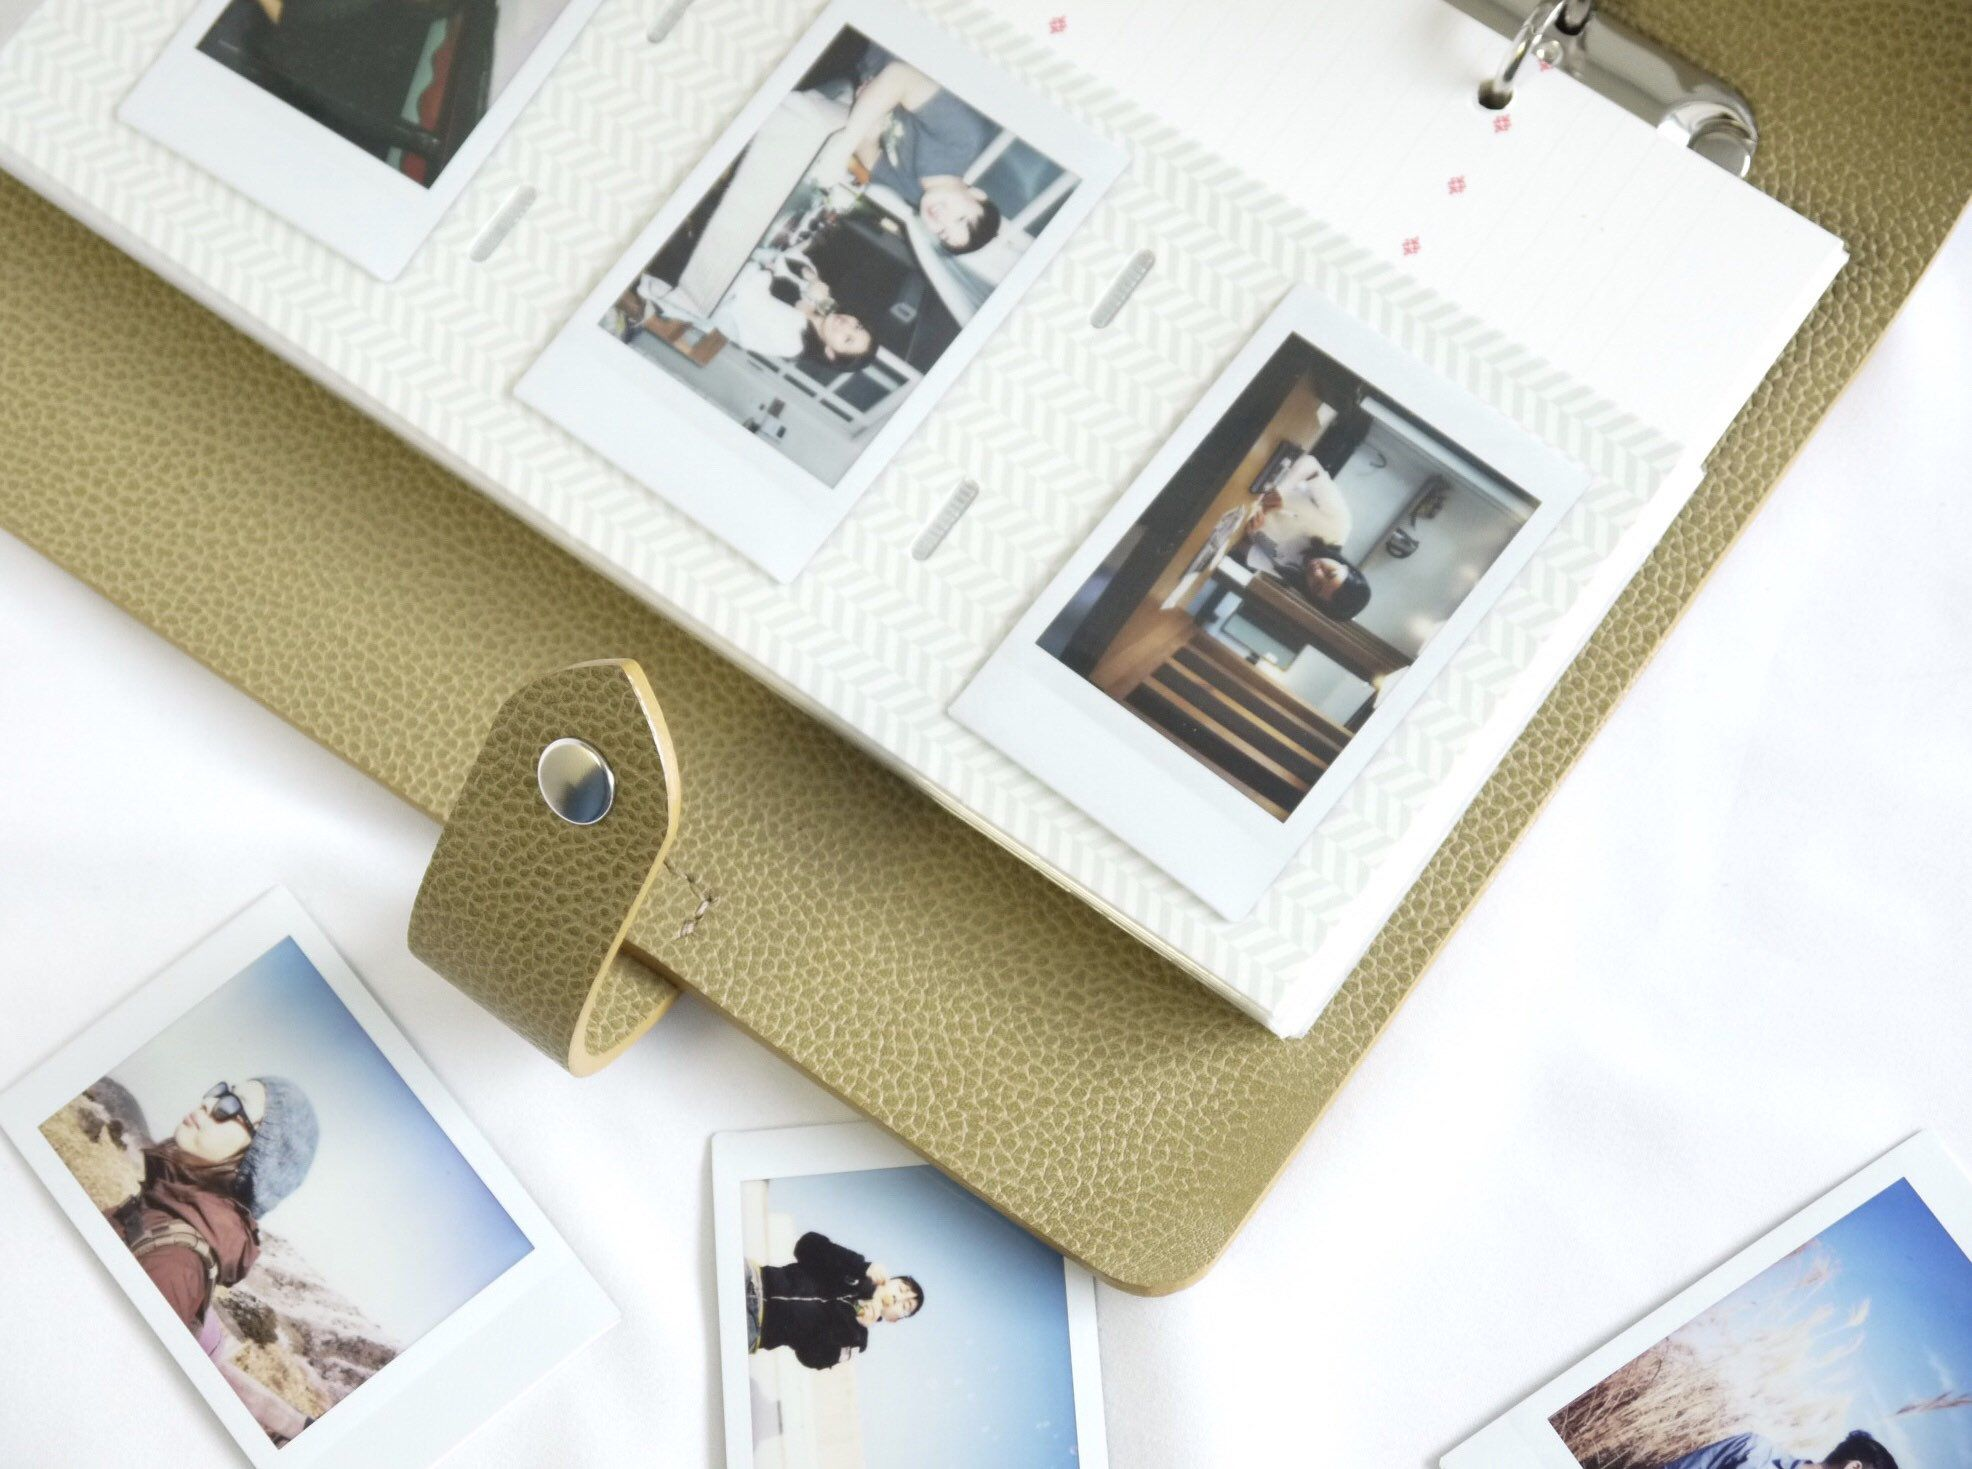 Vintage Braided Strap Chocolate Brown Genuine Leather Instant Polaroid Fuji Instax Mini Photo Album Card Holders